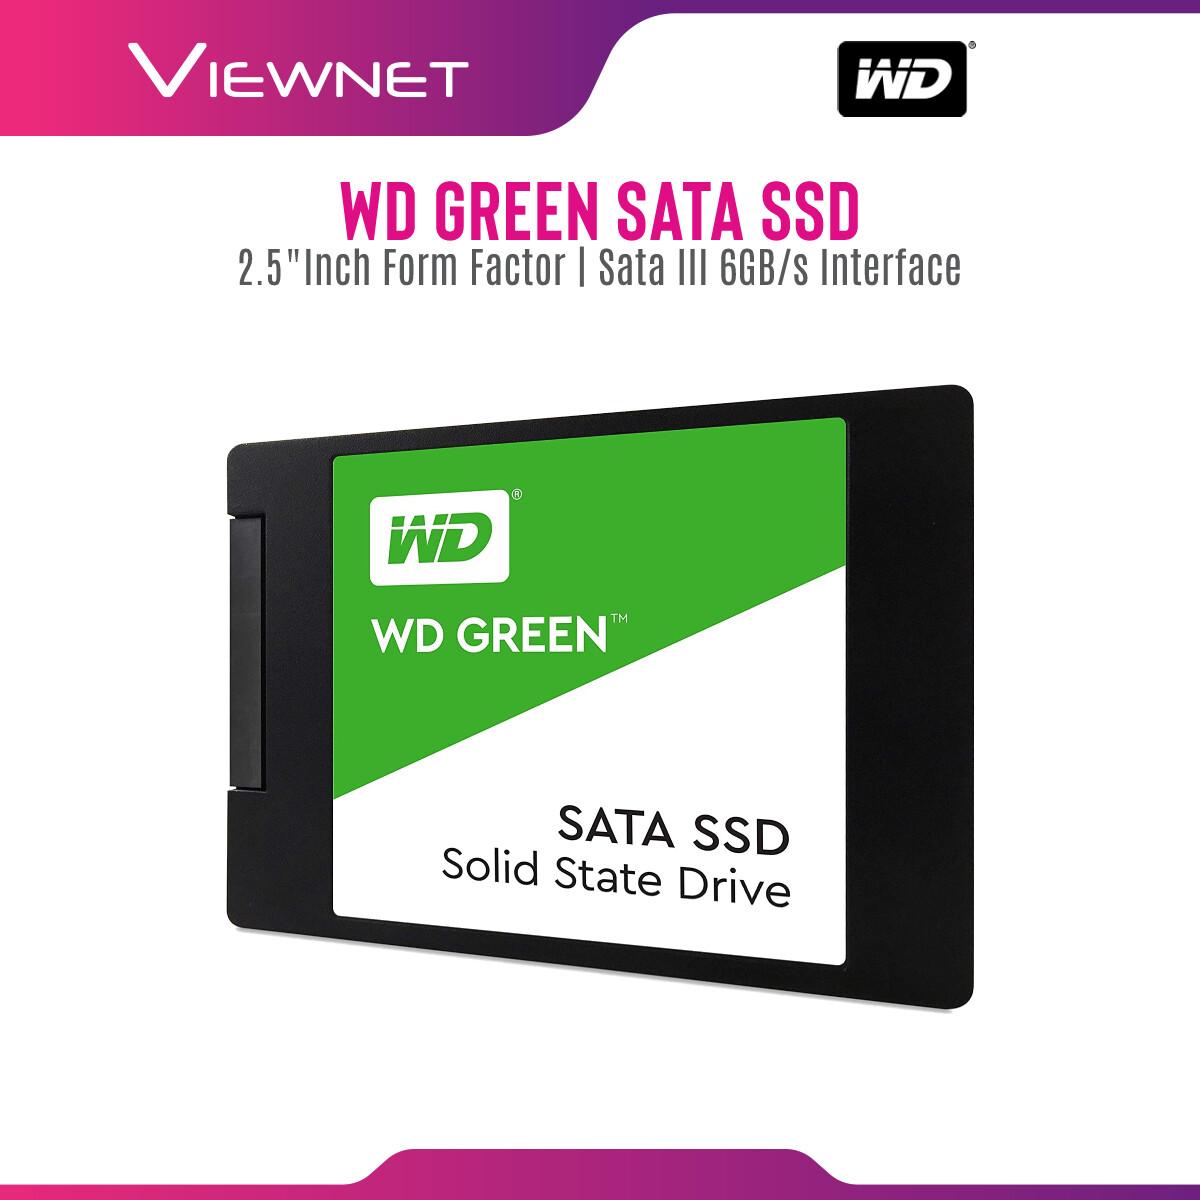 Western Digital SATA Green 120GB / 240GB / 480GB SSD Solid State Drives (WDS120G2G0A / WDS240G2G0A / WDS480G2G0A)